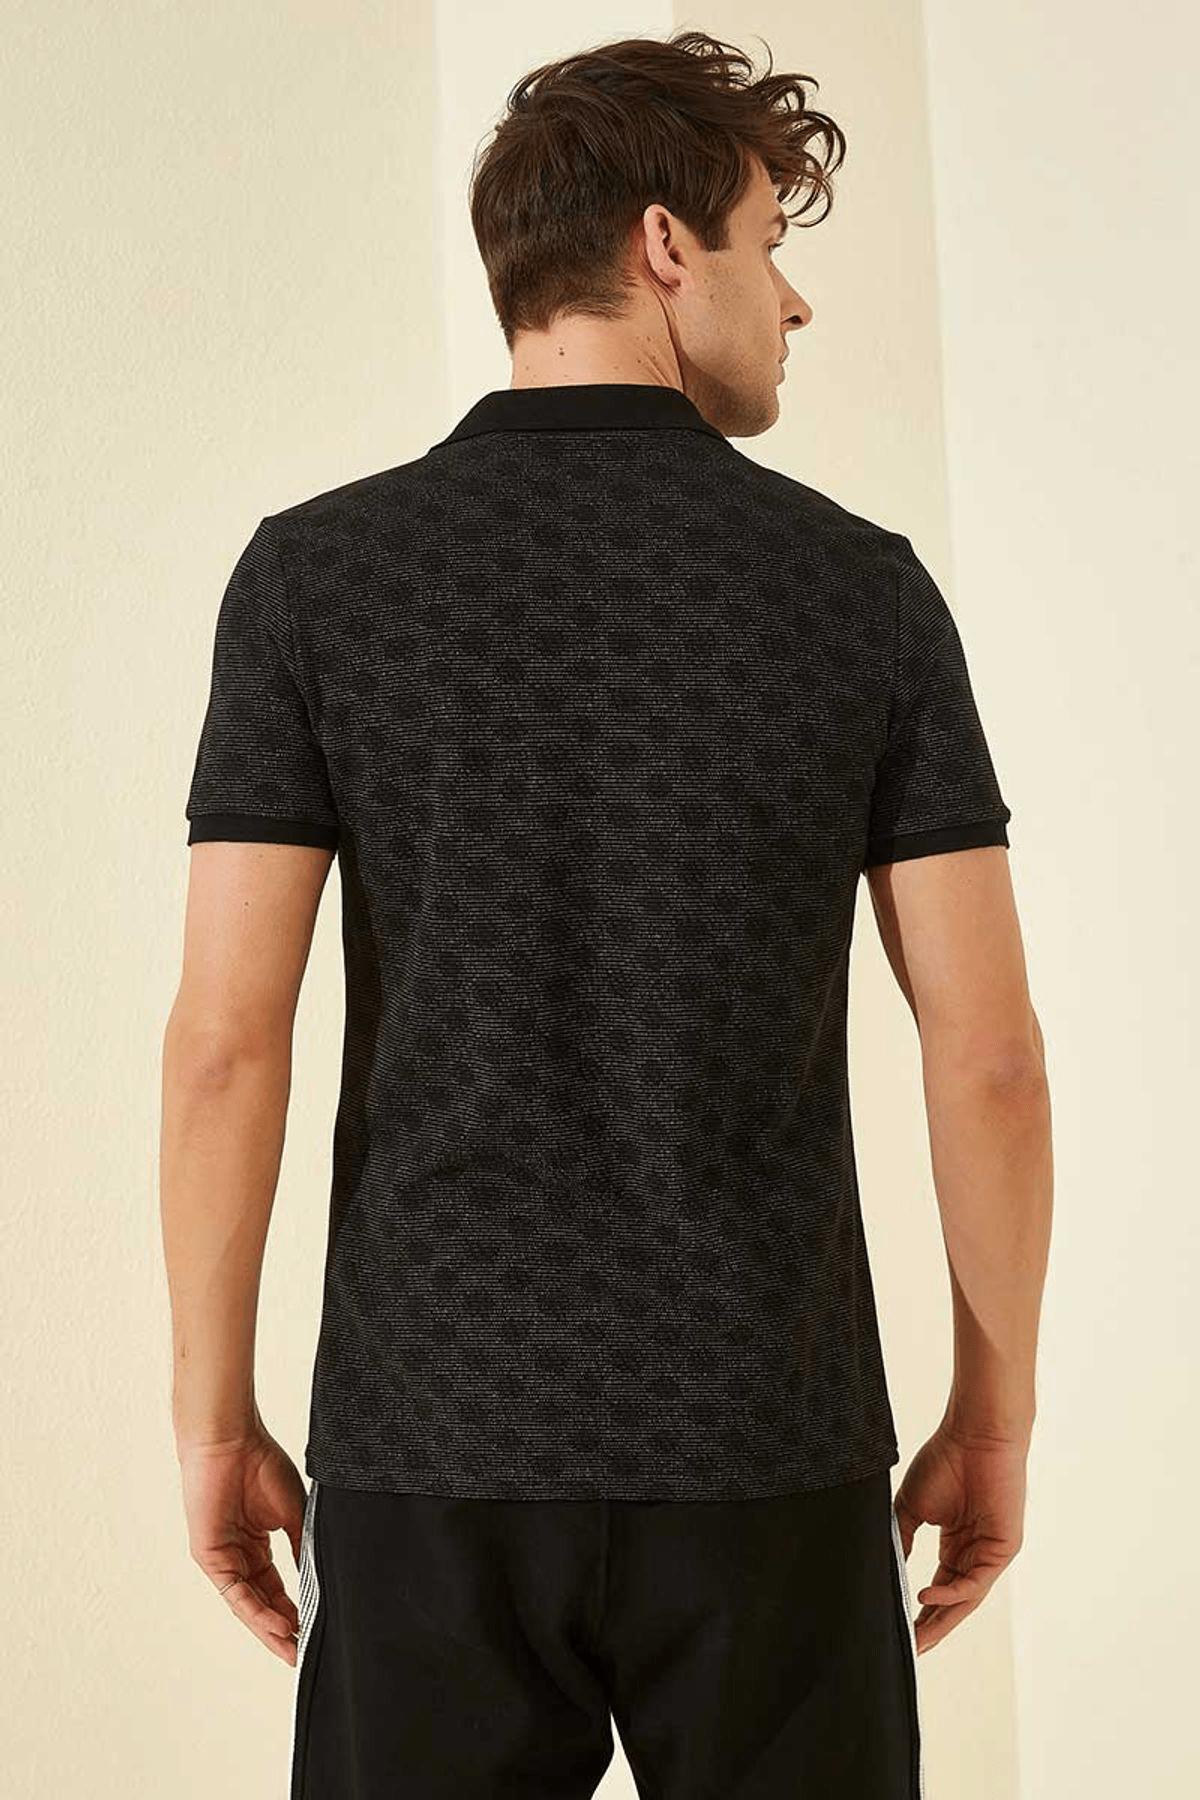 Tommy Life Baskılı Polo Yaka Siyah Erkek T-Shirt T08ER-87796_1 4